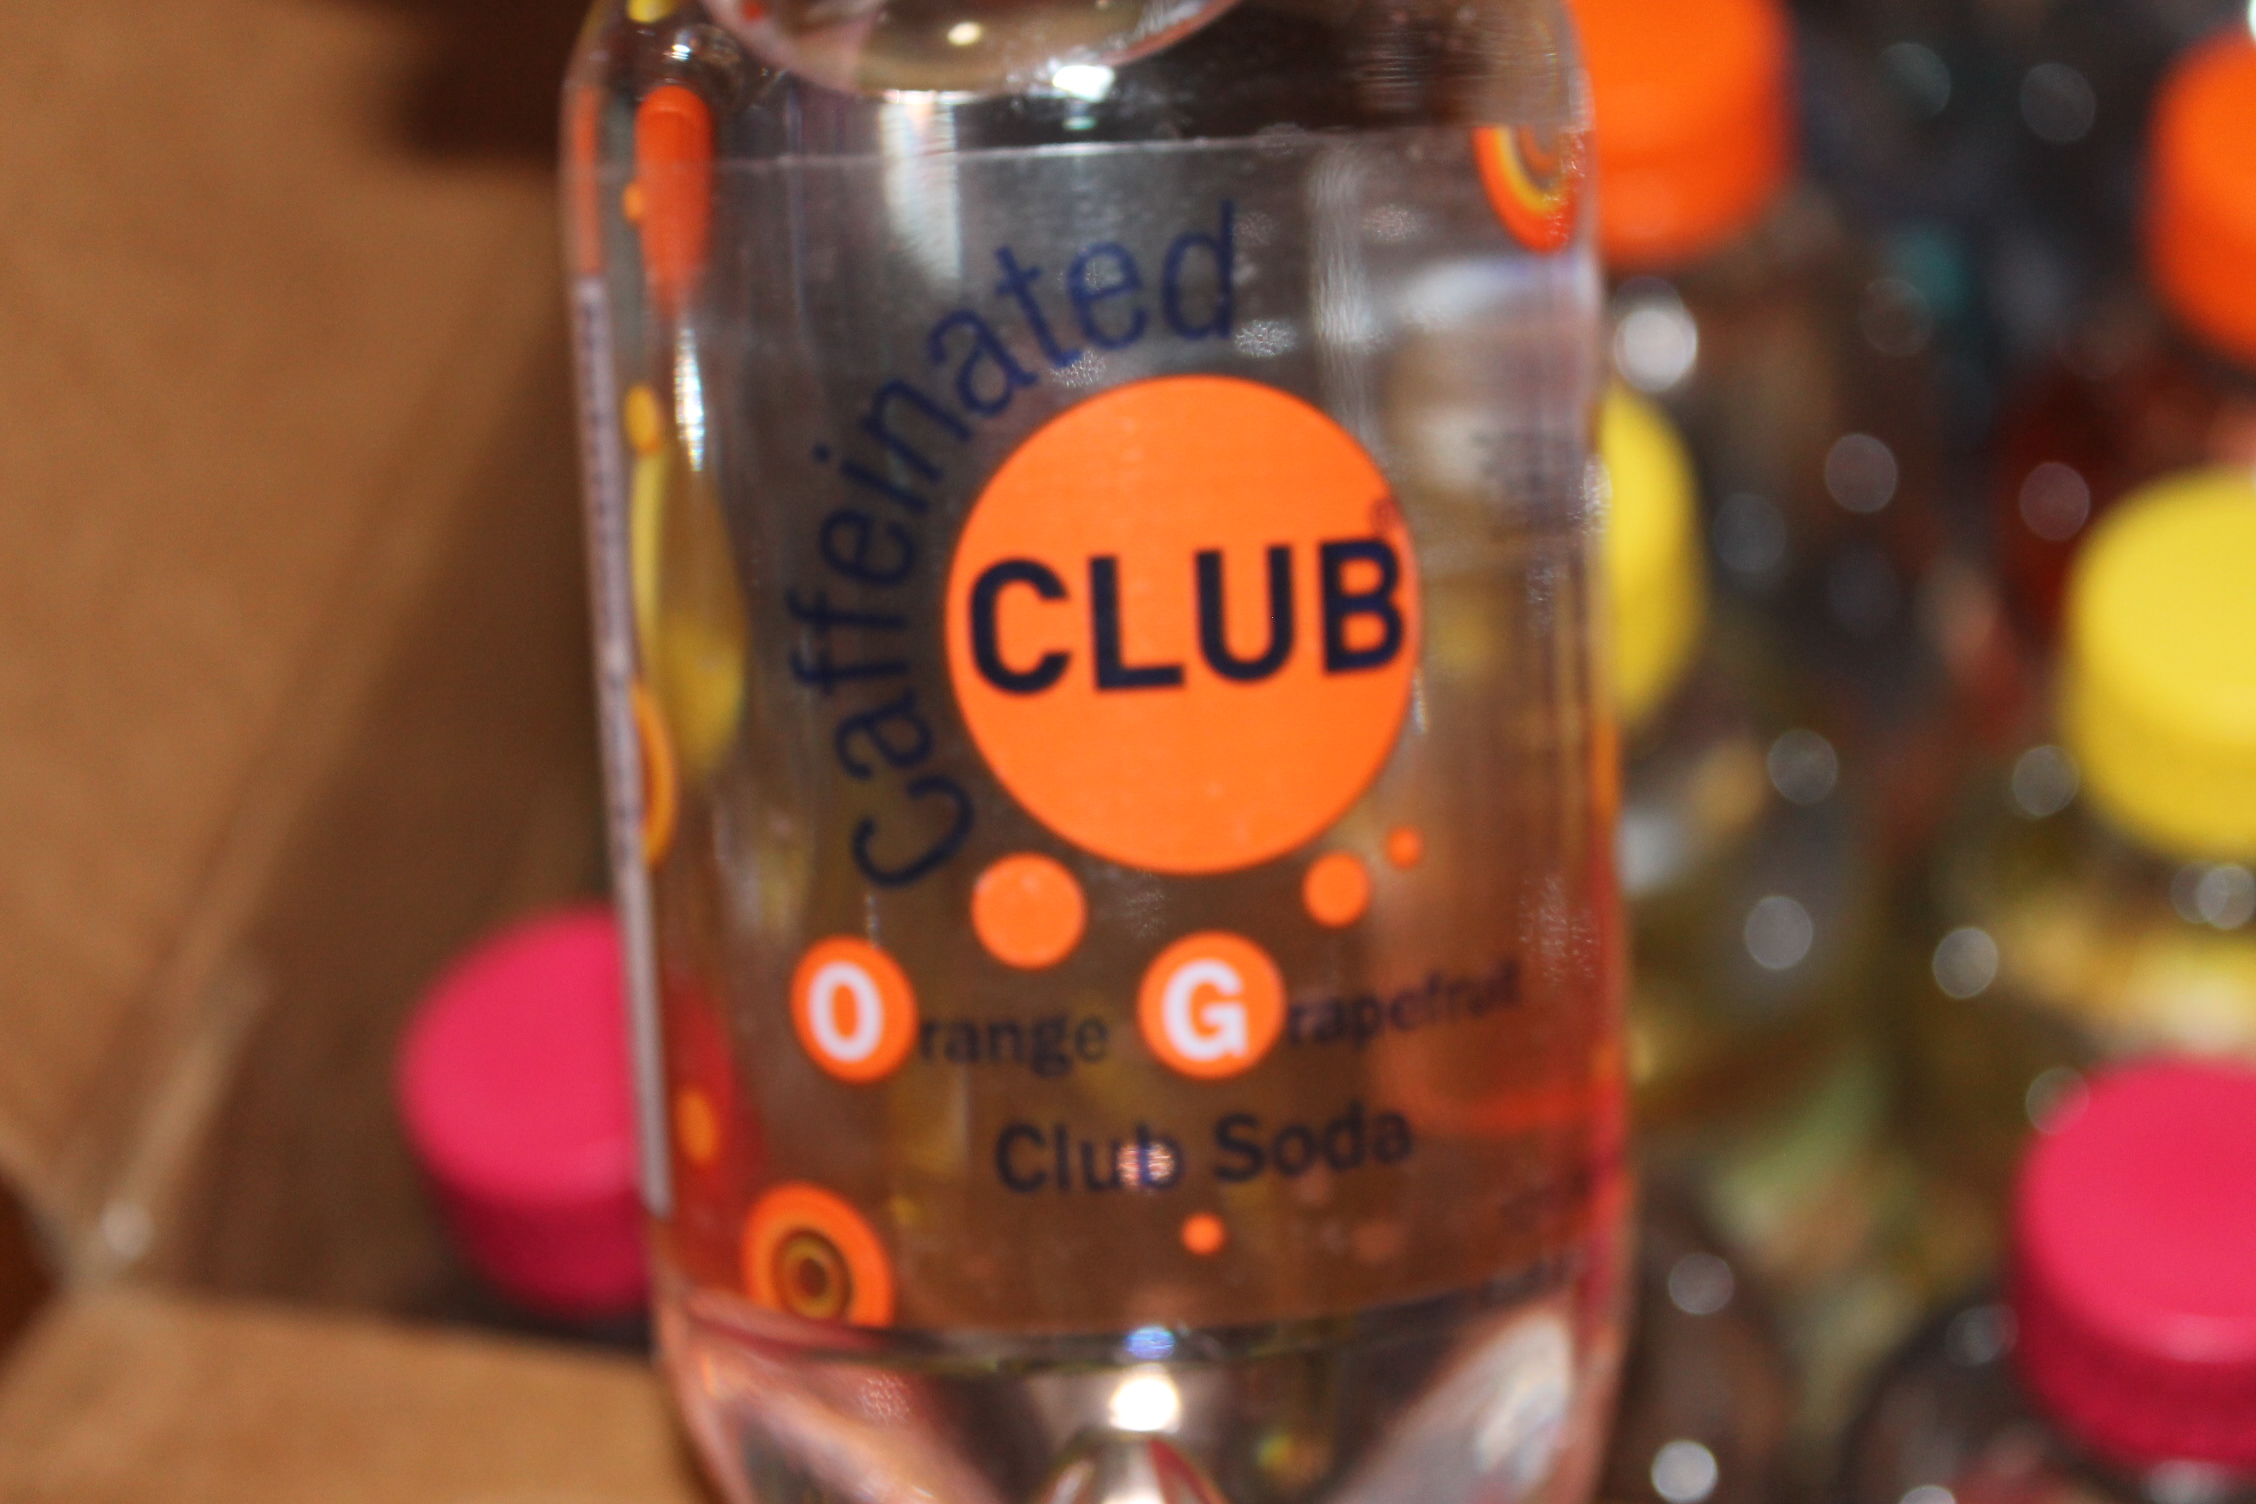 Introducing Caffeinated Club